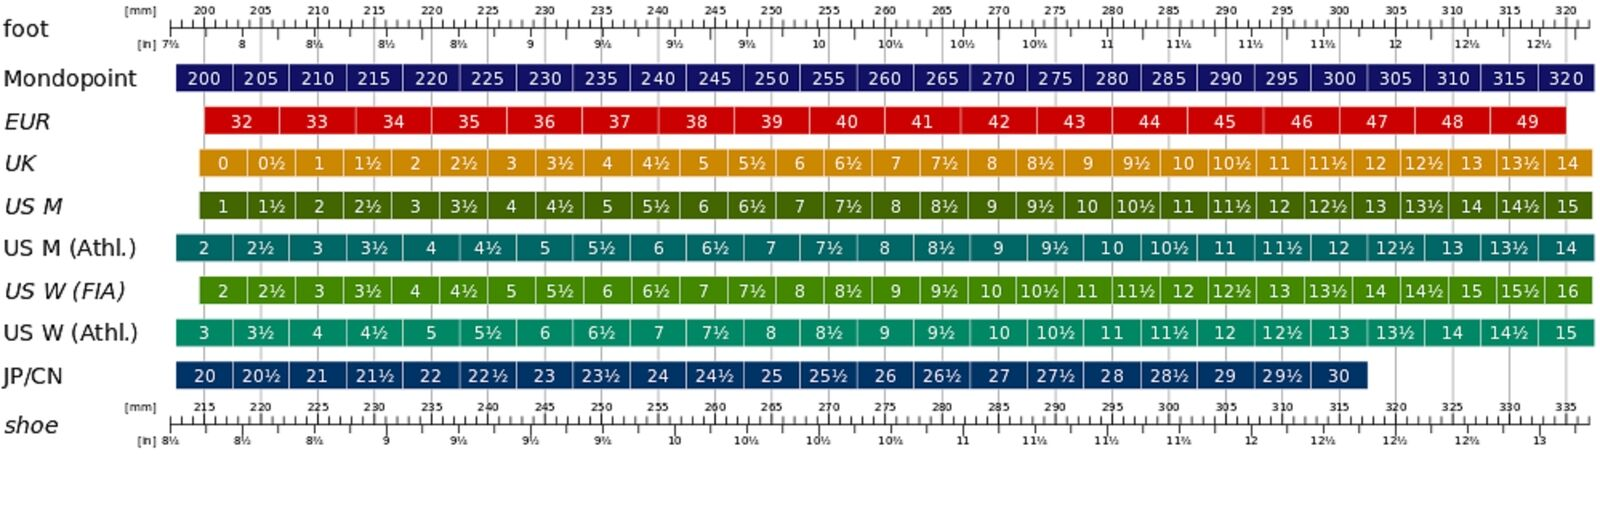 GIARO HIGH 4.5 HEELS schuhe UK4 4.5 HIGH EU38 ZIP WEDGES LEOPARD SEXY FETISH CD PLEASER 095d75